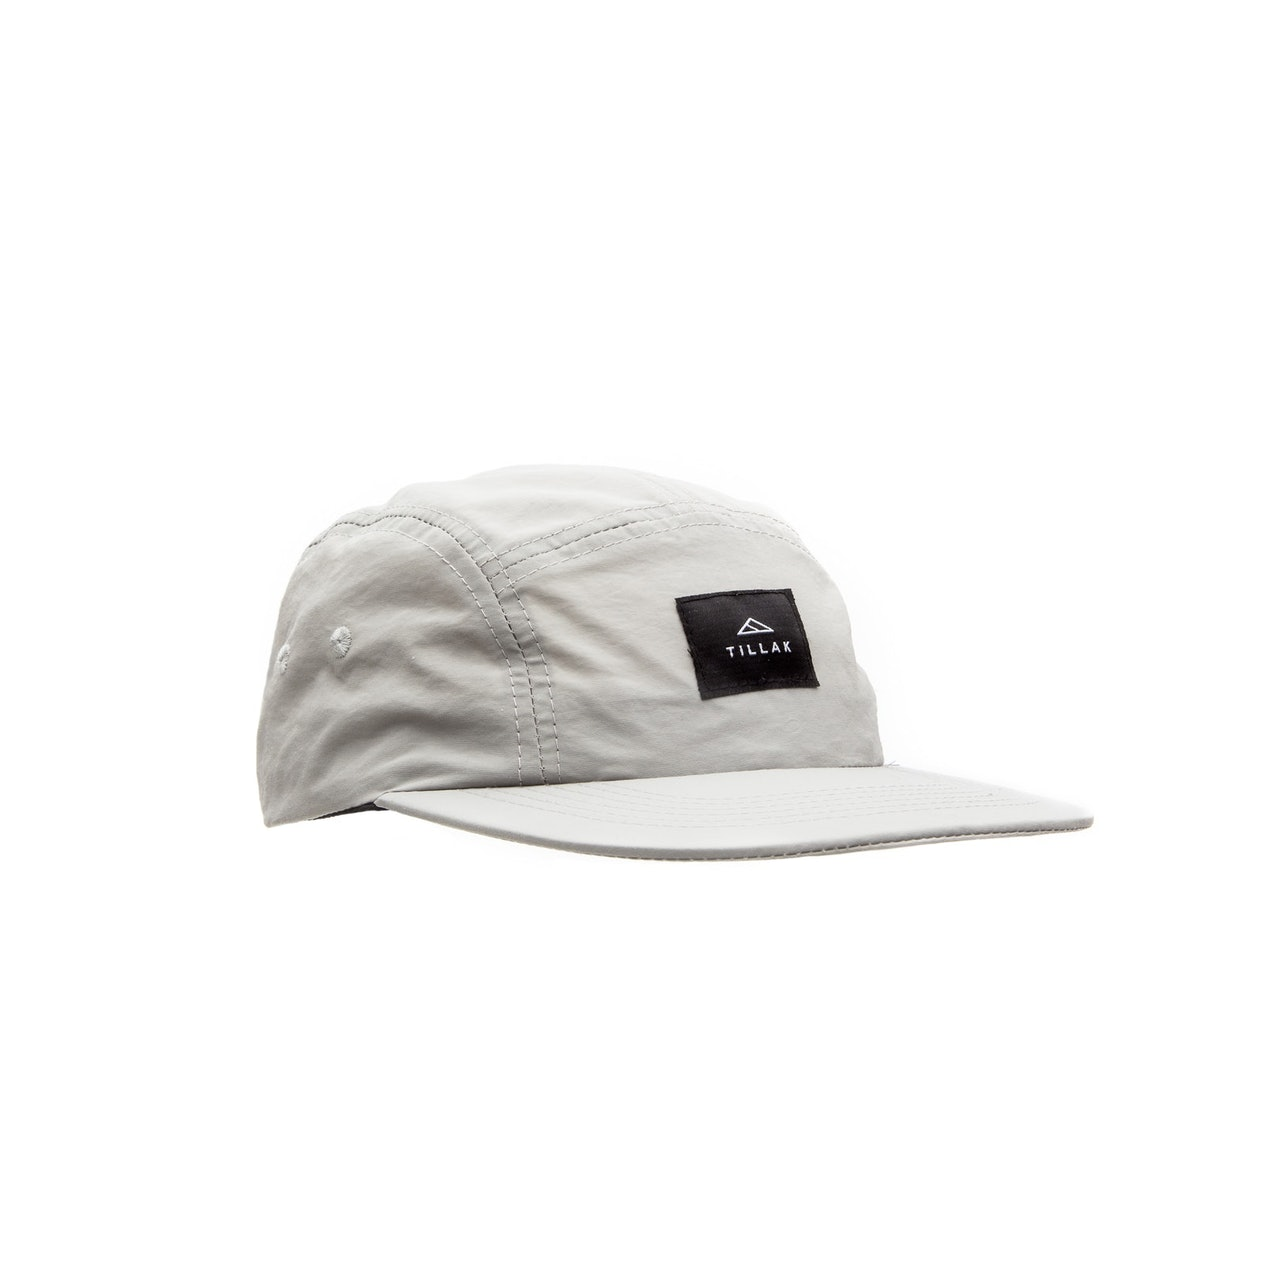 Tillak Wallowa Granite Grey Hat by Tillak Portland for Conscious by Chloé